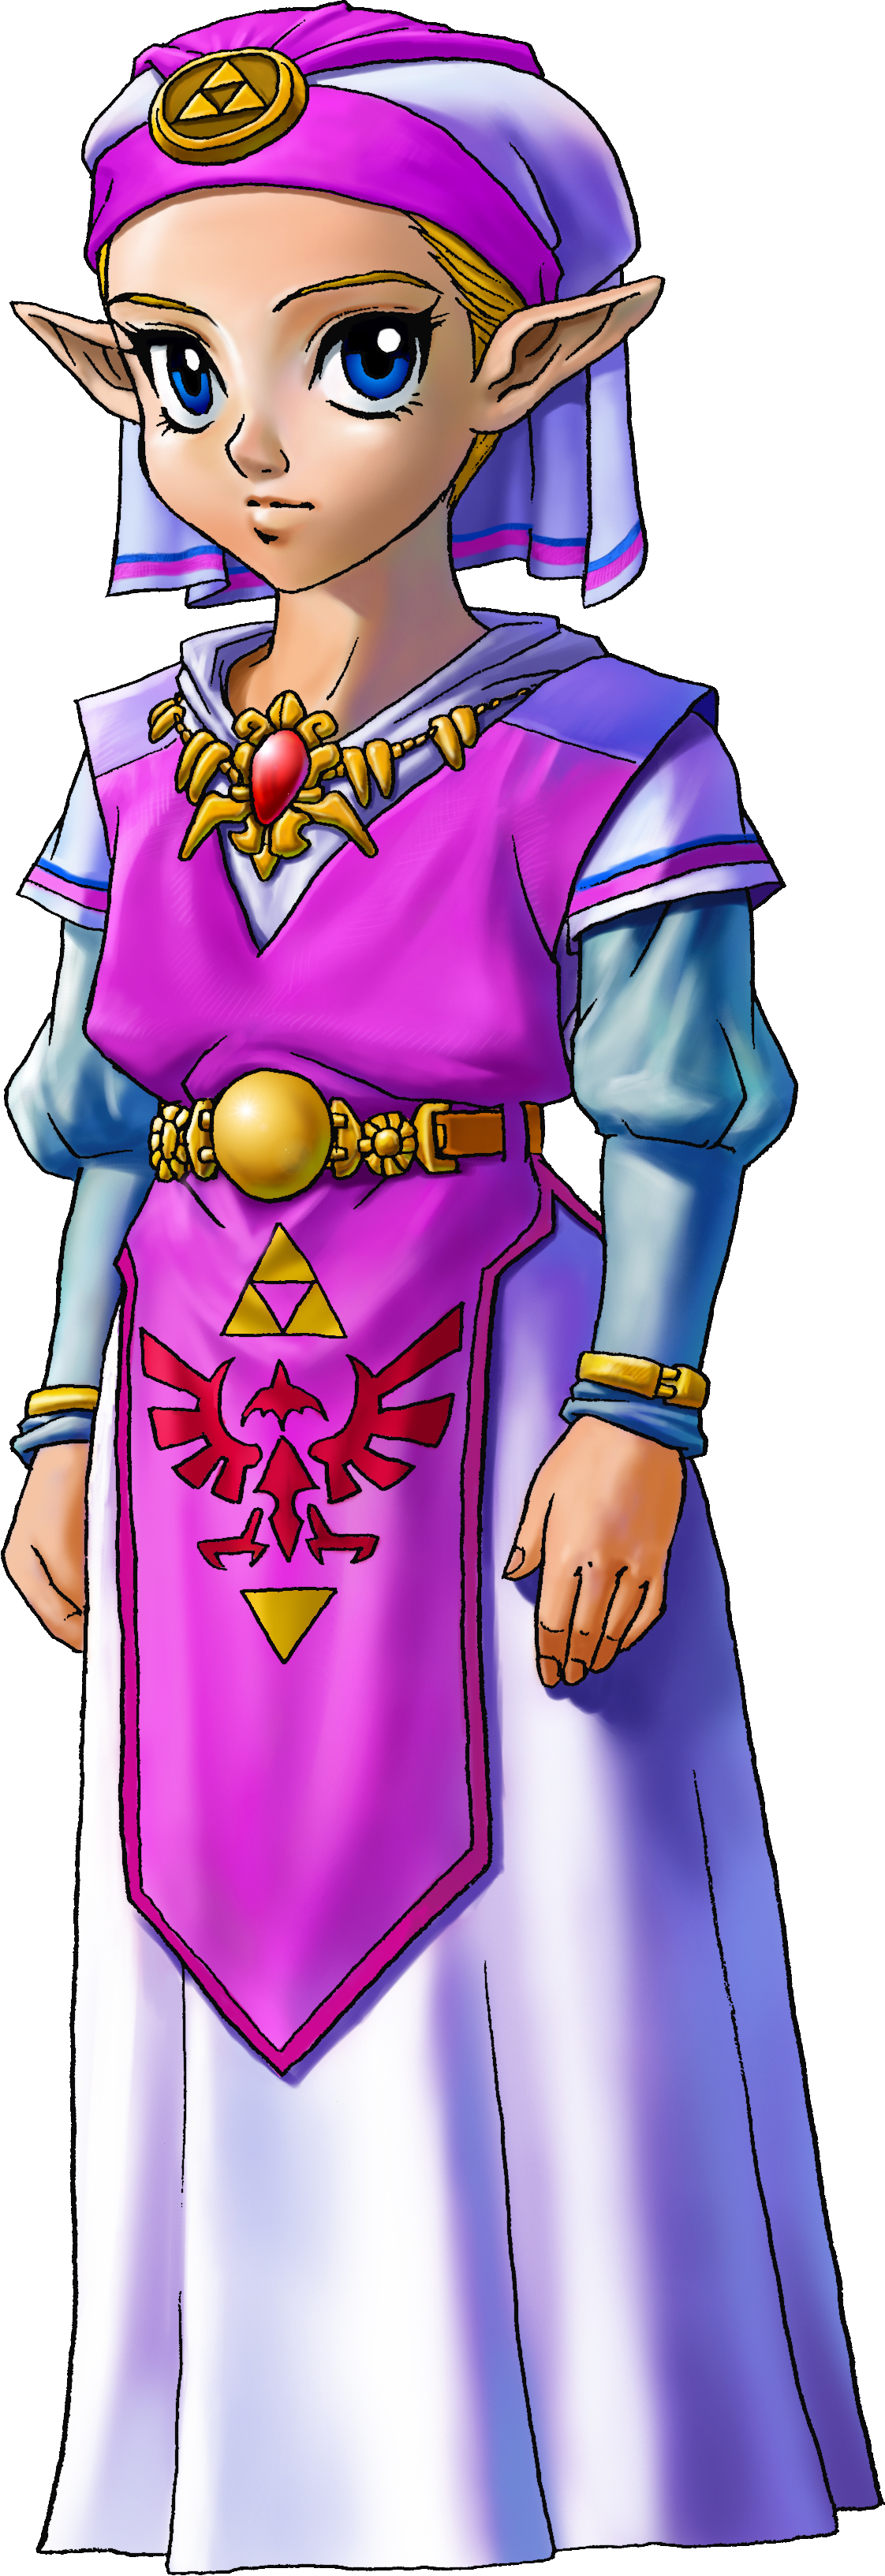 [POST OFICIAL] The Legend of Zelda: Ocarina of Time 3D Young_Princess_Zelda_%28Ocarina_of_Time%29